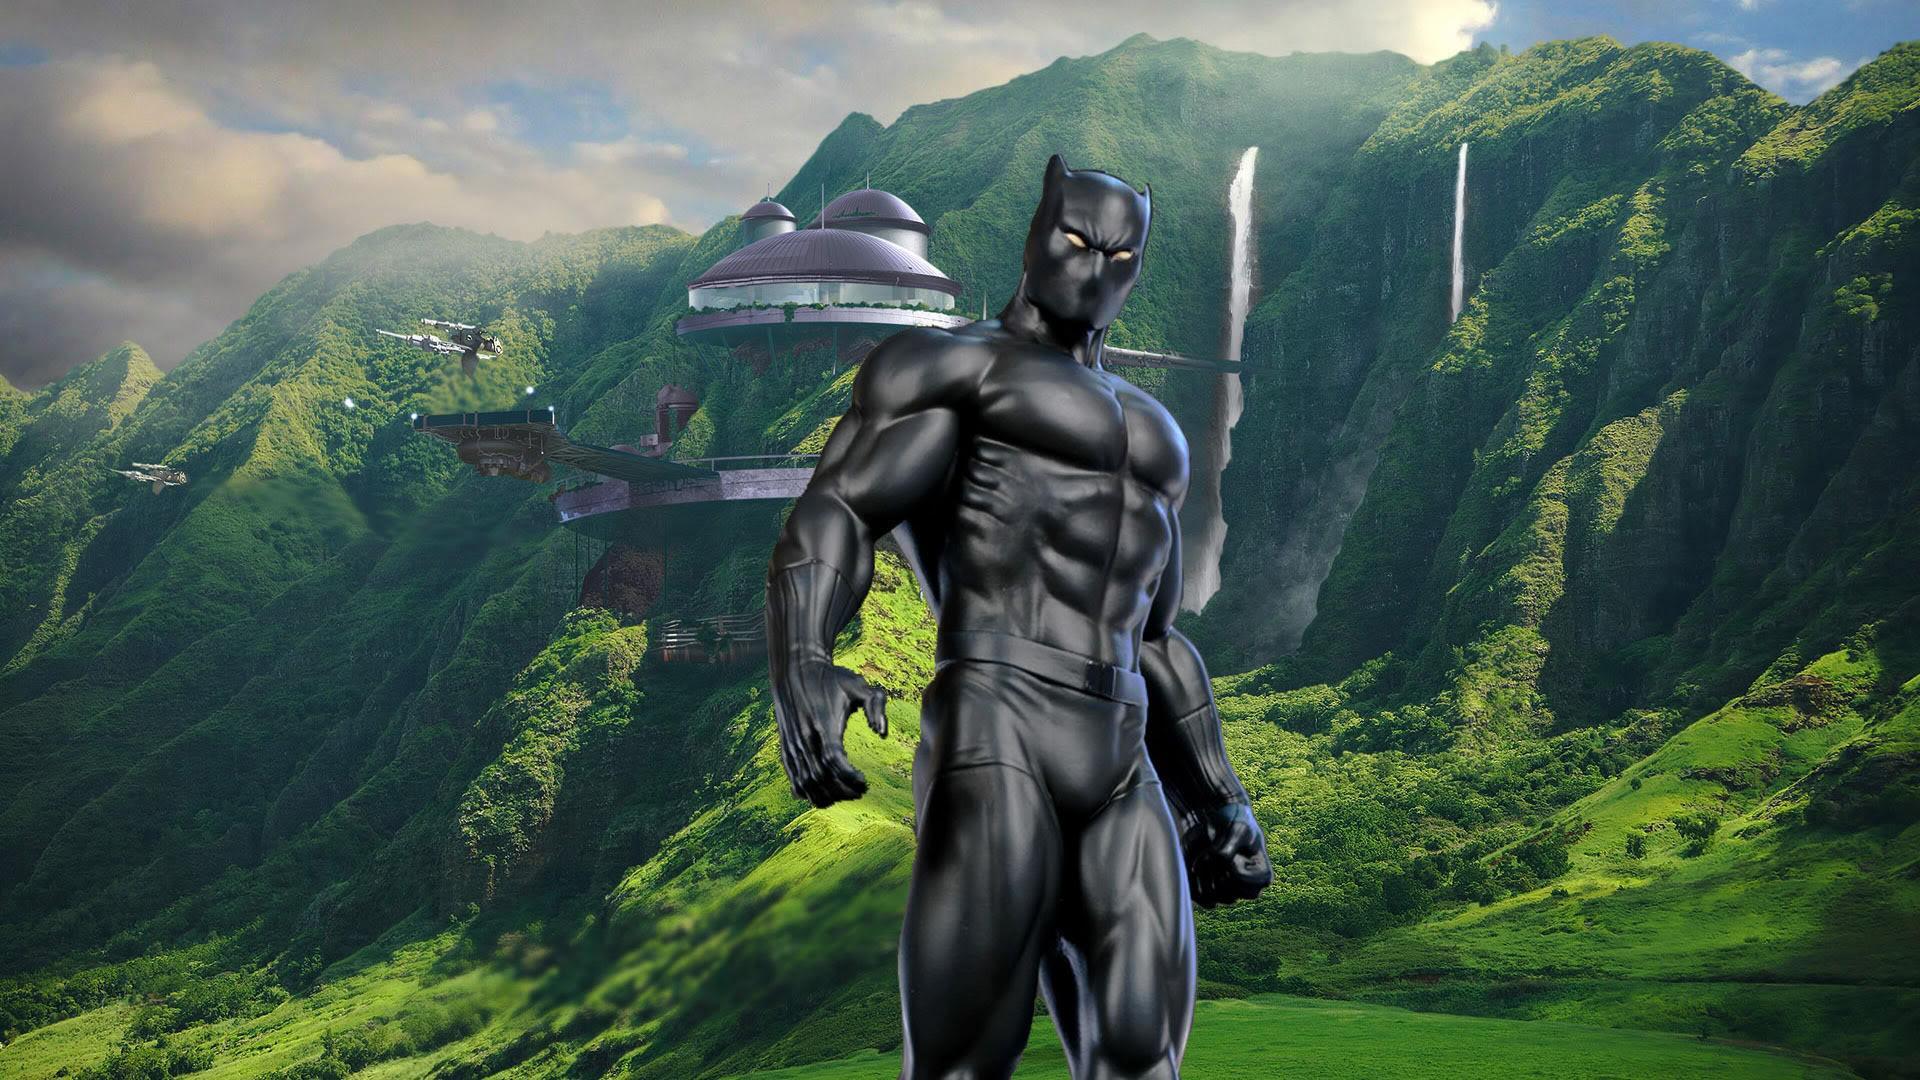 Download 2017 Black Panther Desktop Background HD Wallpaper Search 1920x1080